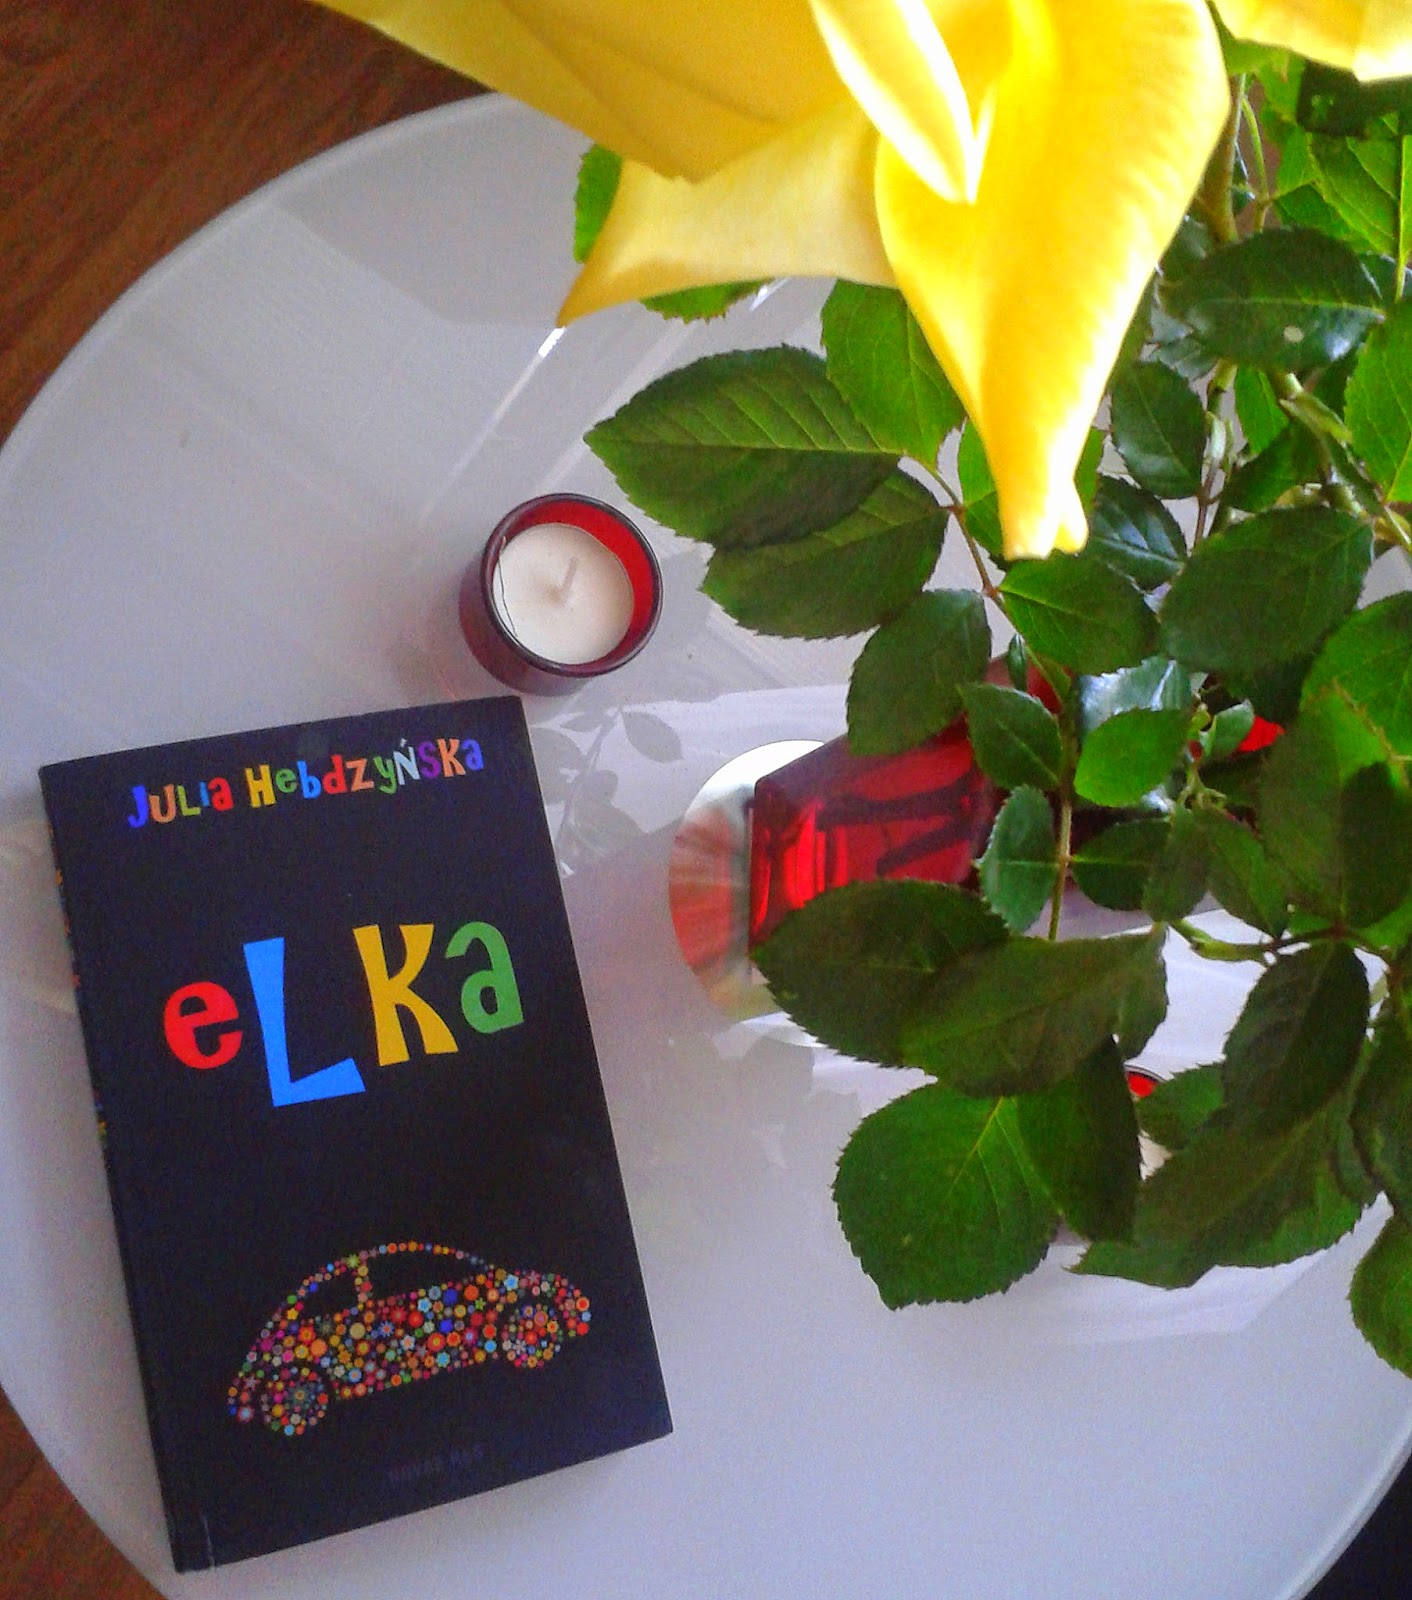 http://mirabelkowabiblioteczka.blogspot.com/2014/10/elka-julia-hebdzynska.html